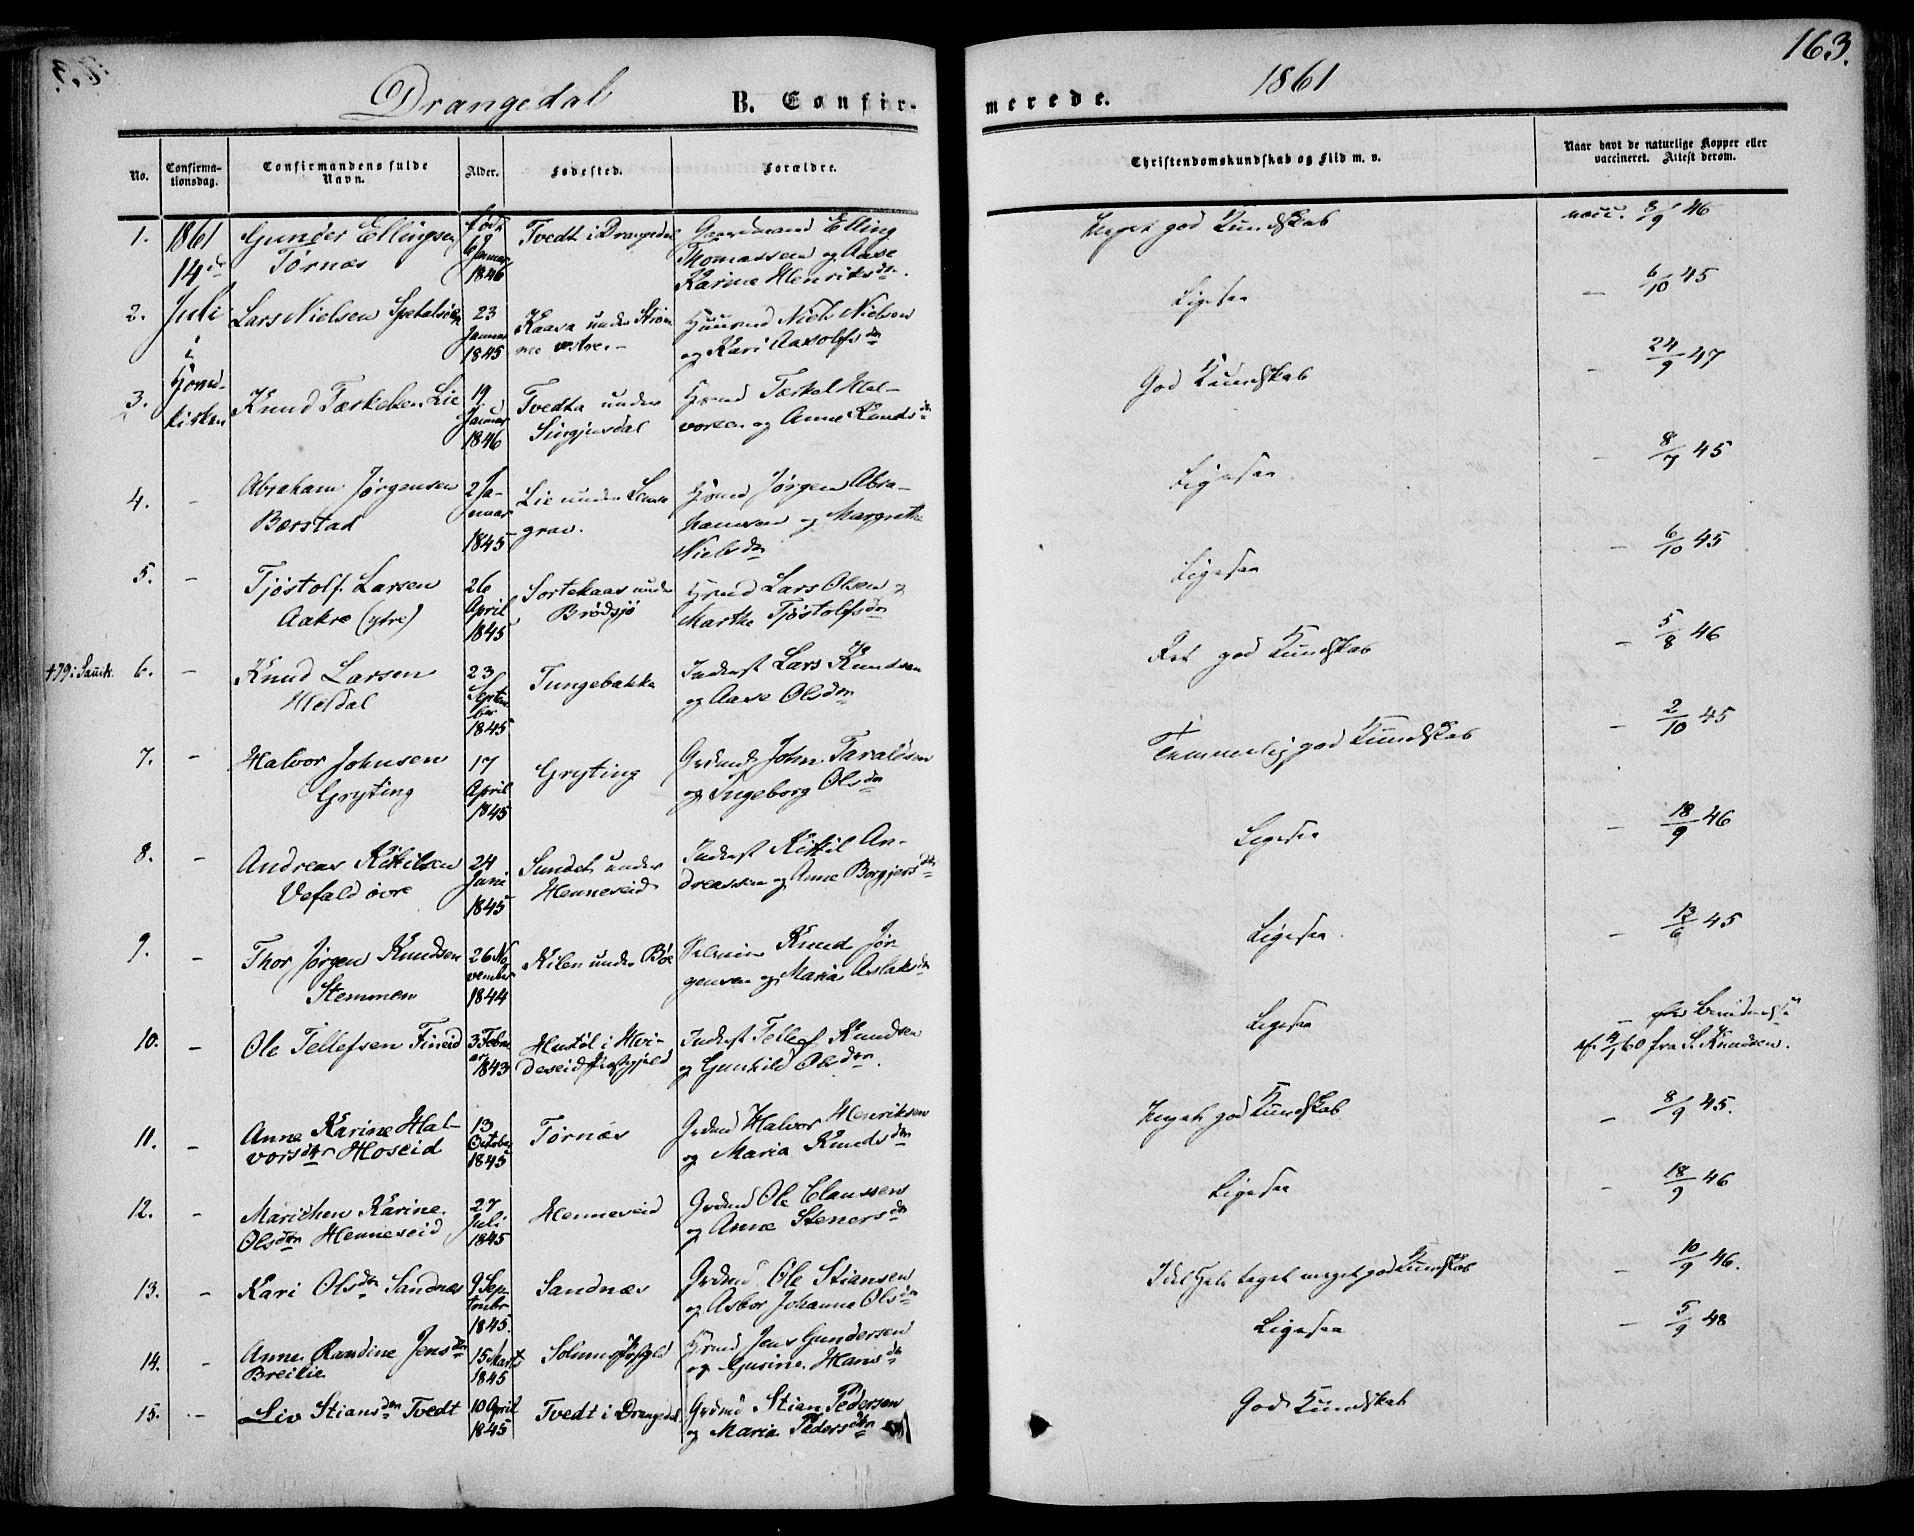 SAKO, Drangedal kirkebøker, F/Fa/L0008: Ministerialbok nr. 8, 1857-1871, s. 163